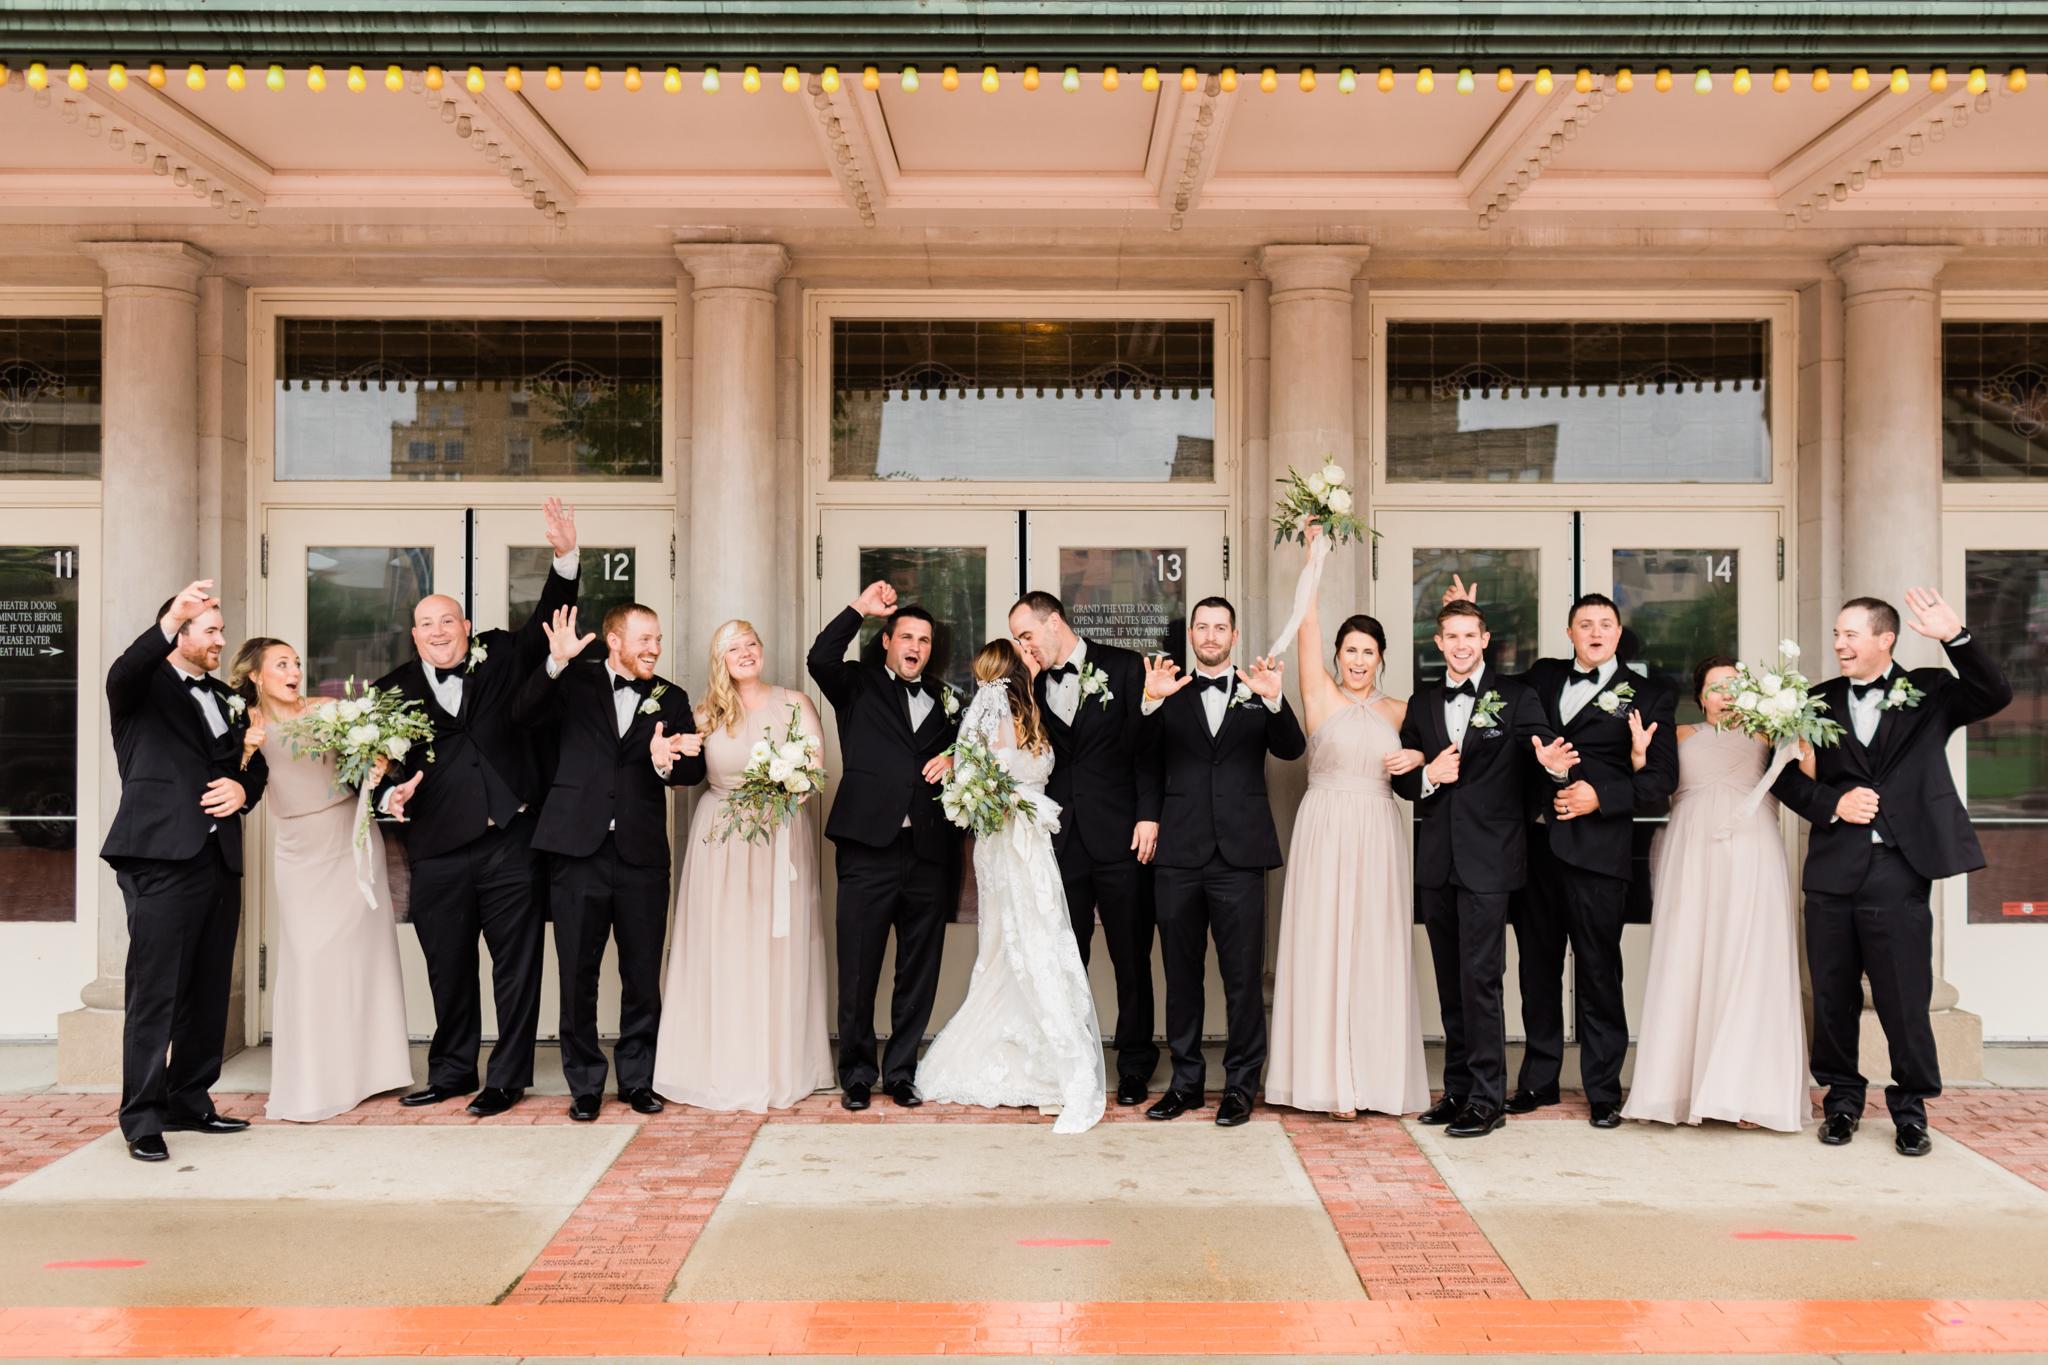 28-Katrina-Kyle-Jefferson-Inn-Wisconsin-Bride-James-Stokes-Photography.jpg